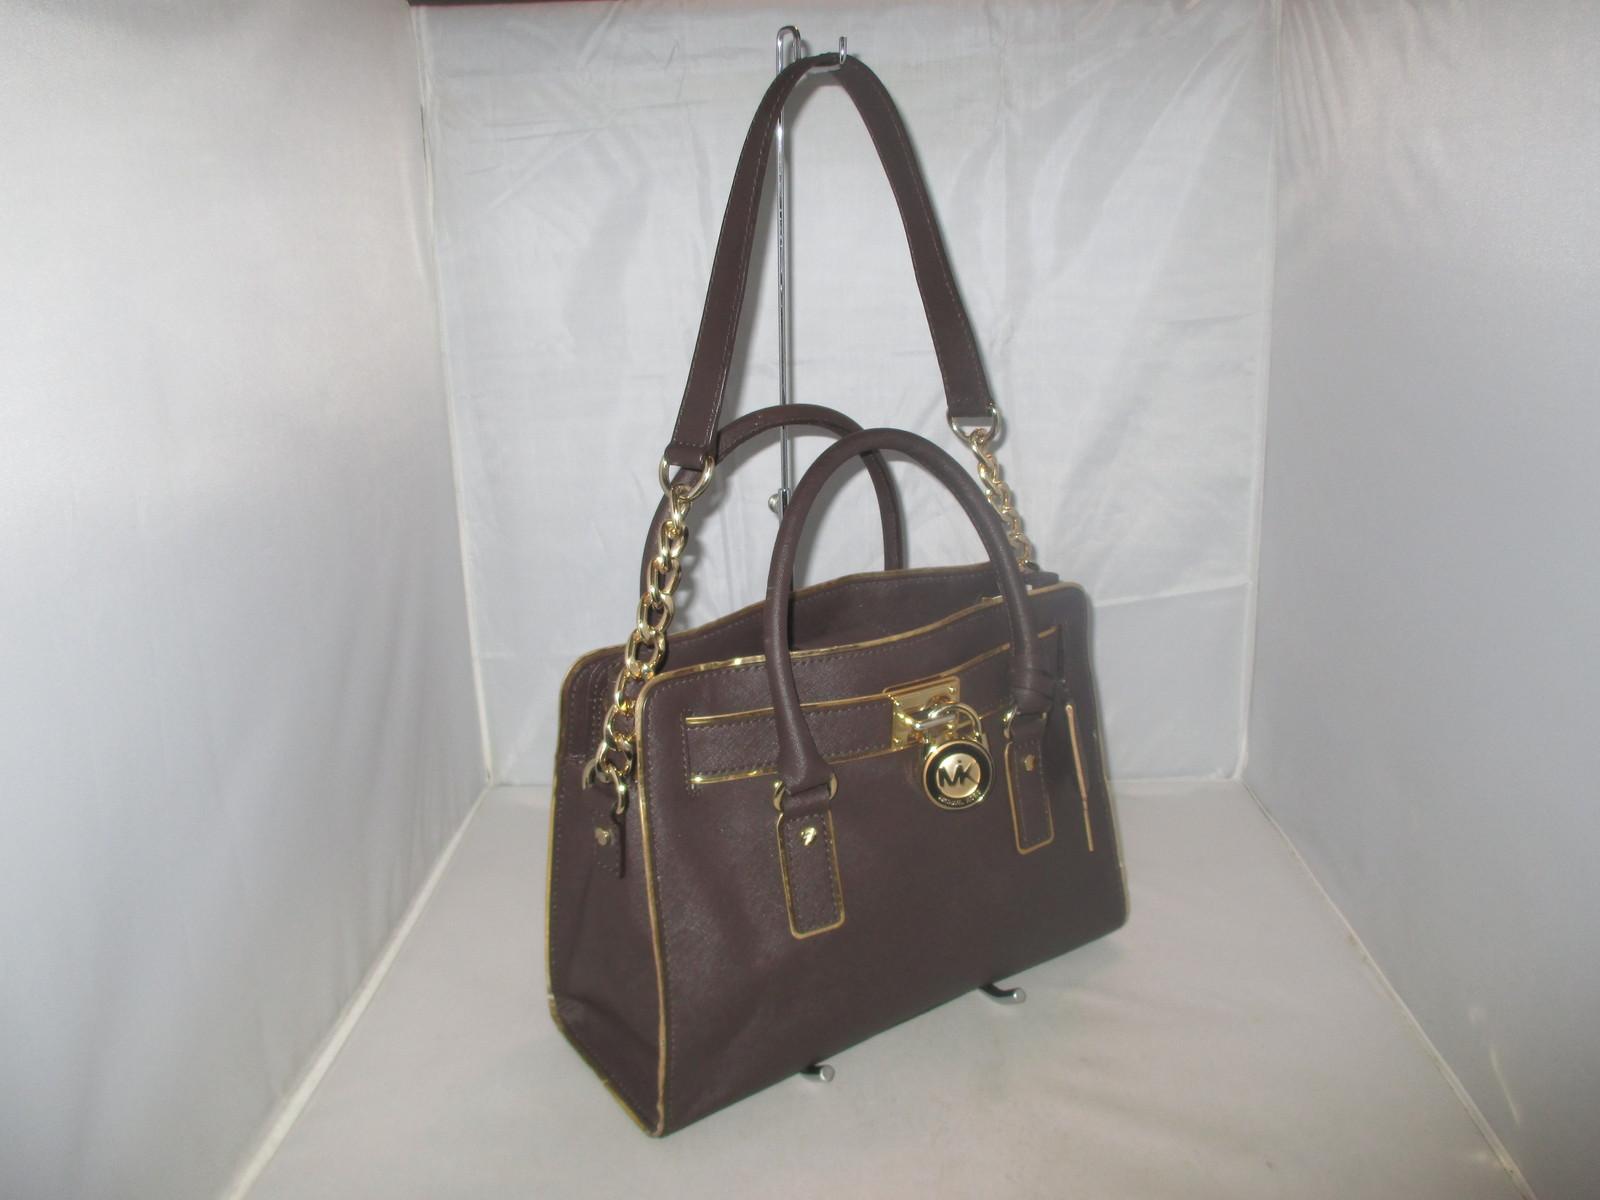 4434546d9119 Michael Kors Handbag Hamilton Specchio Saffiano Leather Satchel